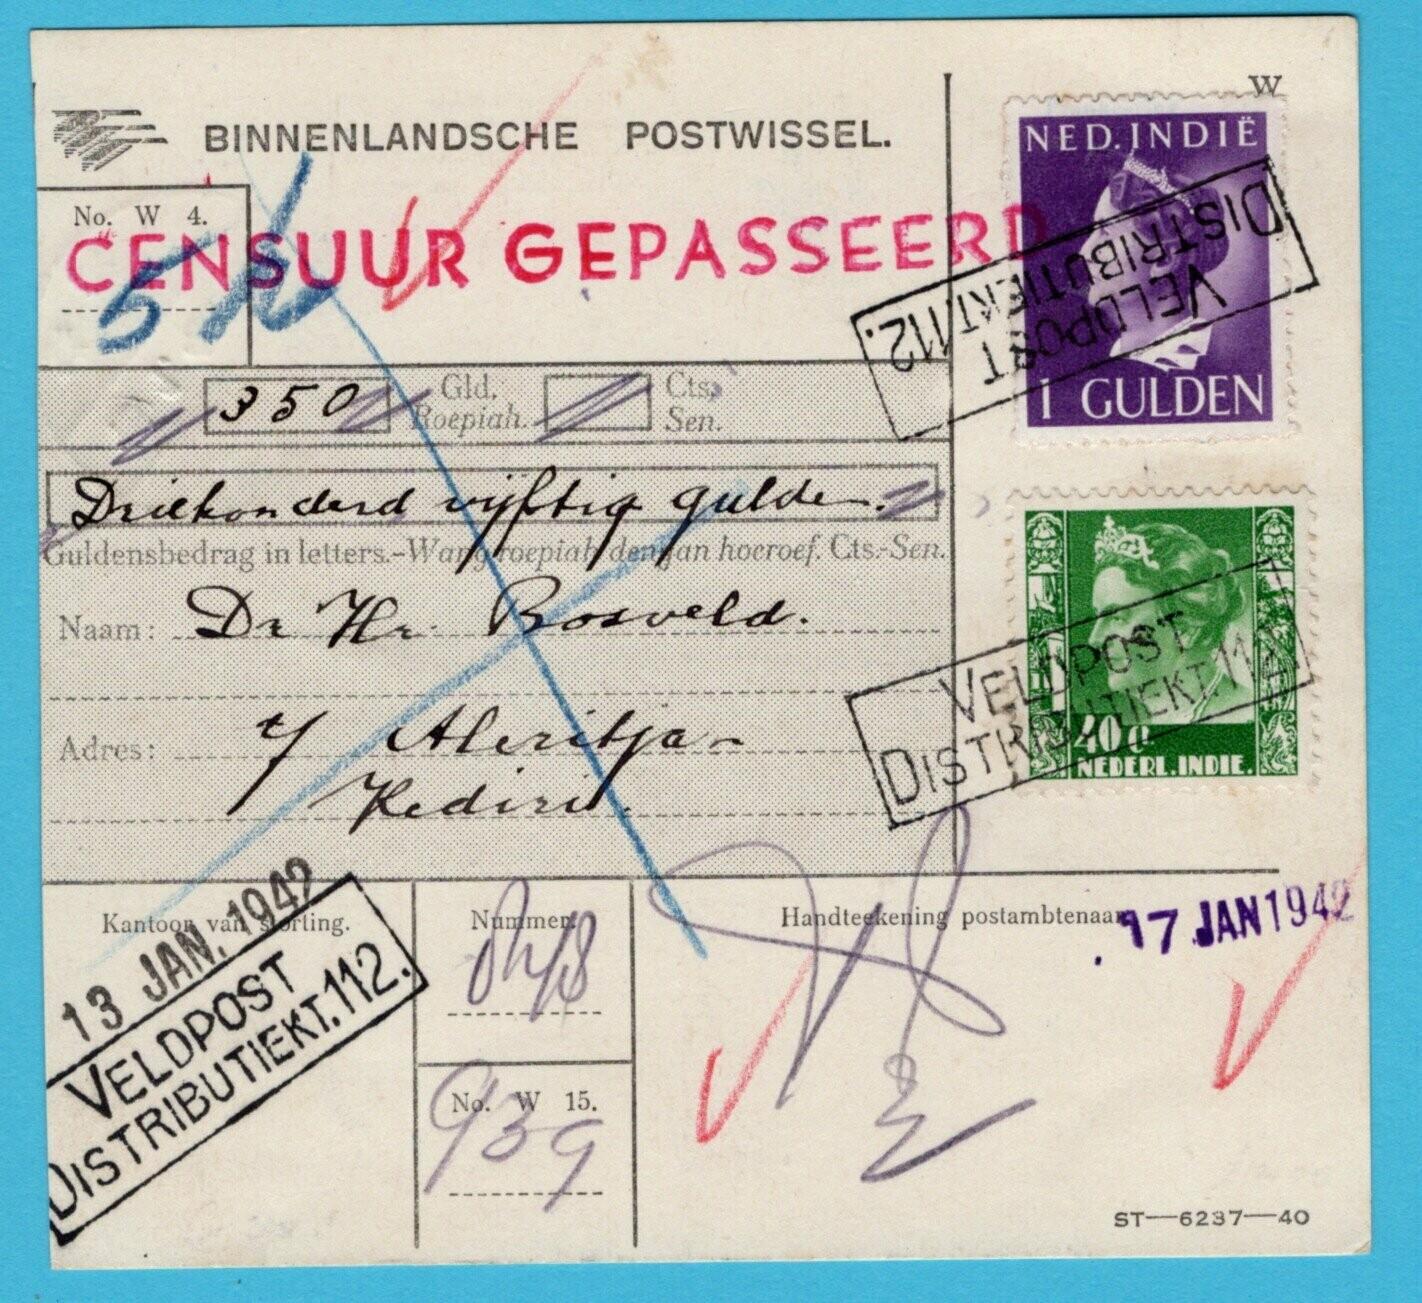 NETHERLANDS EAST INDIES money order 1942 Fieldpost office 112